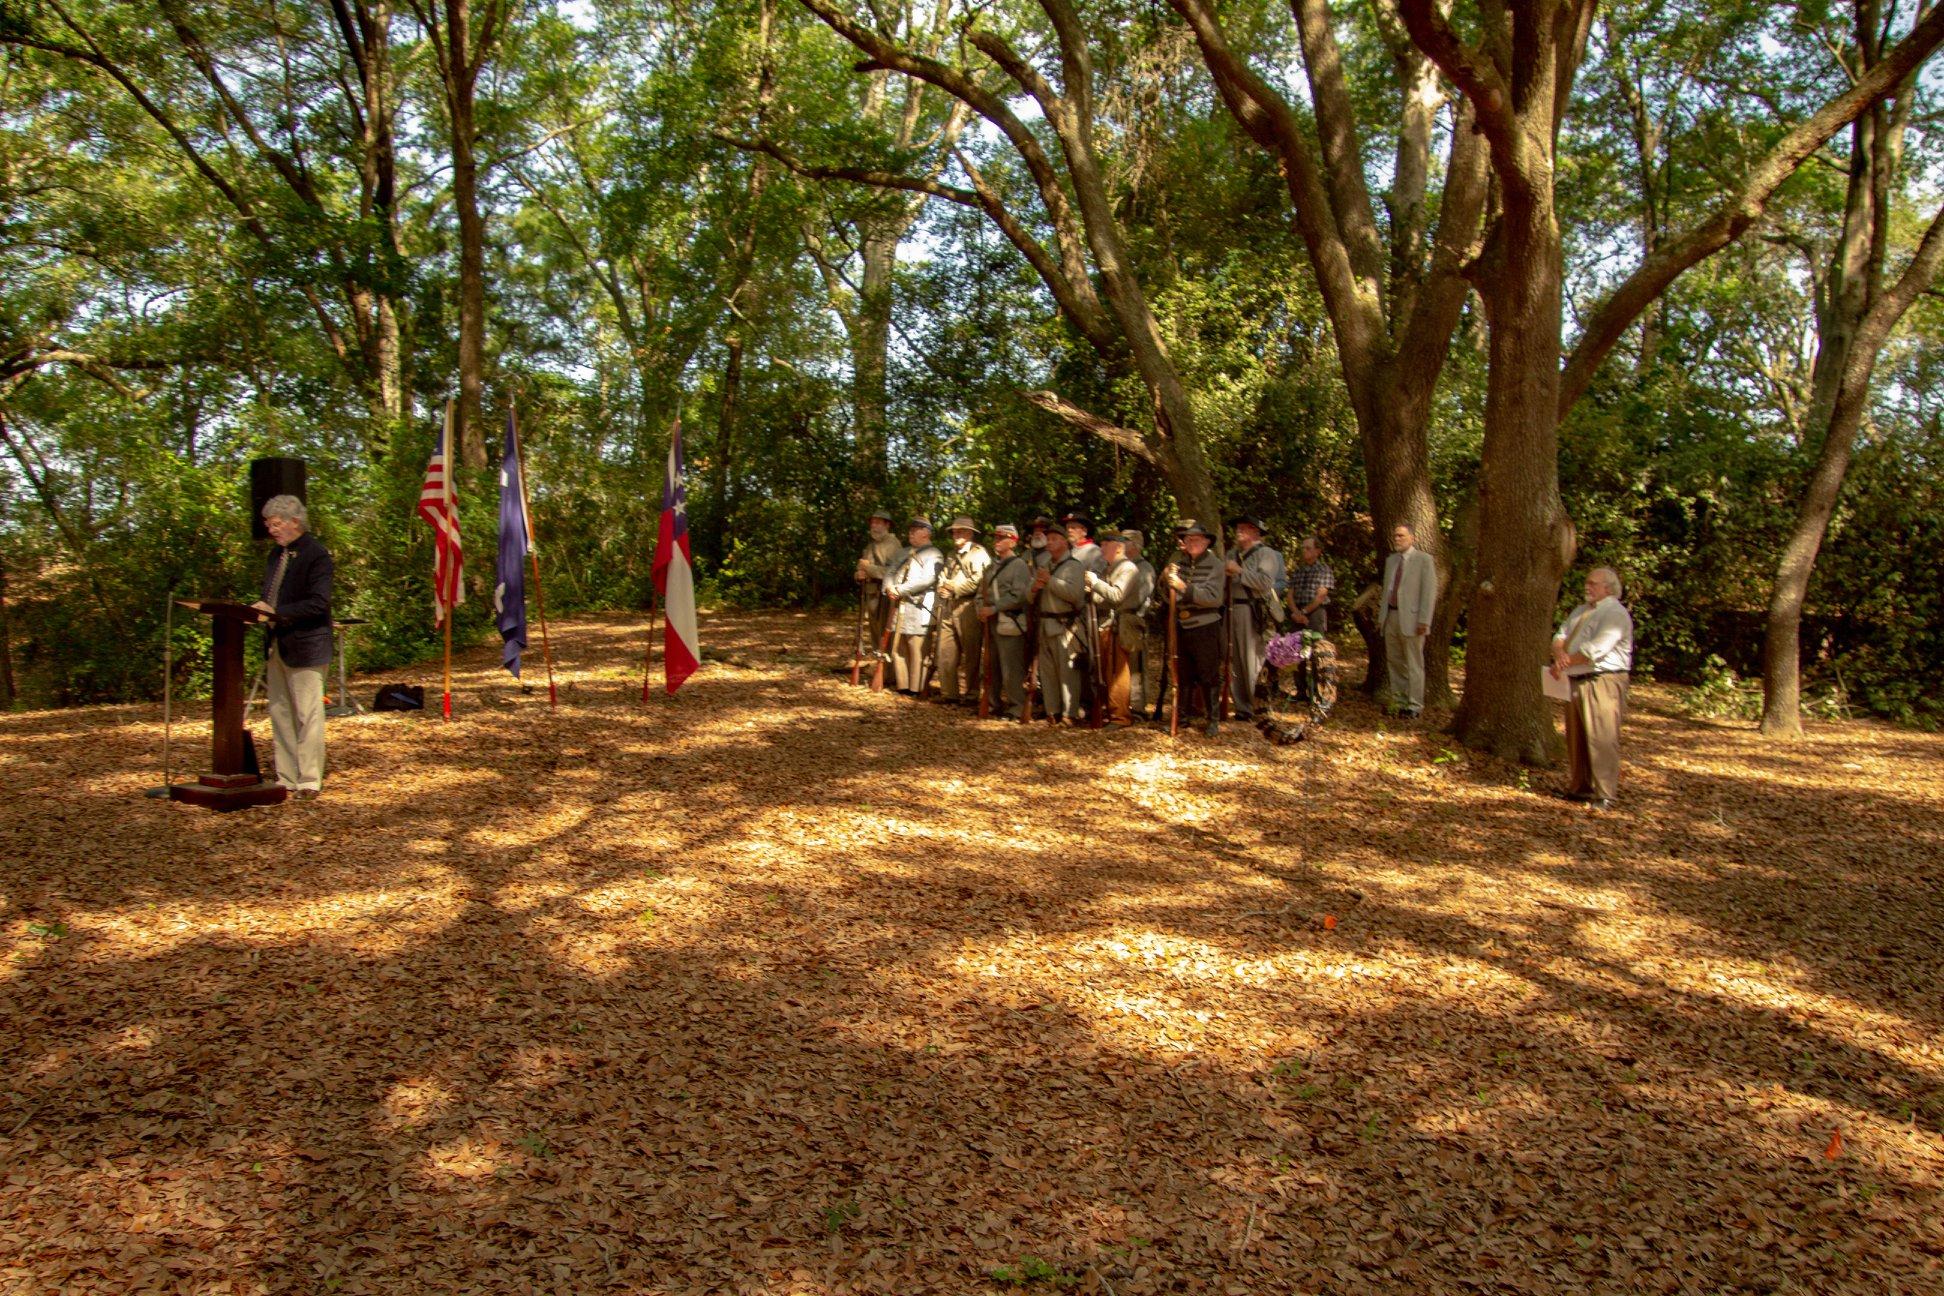 The annual anniversary of the Battle of Secessionville 16